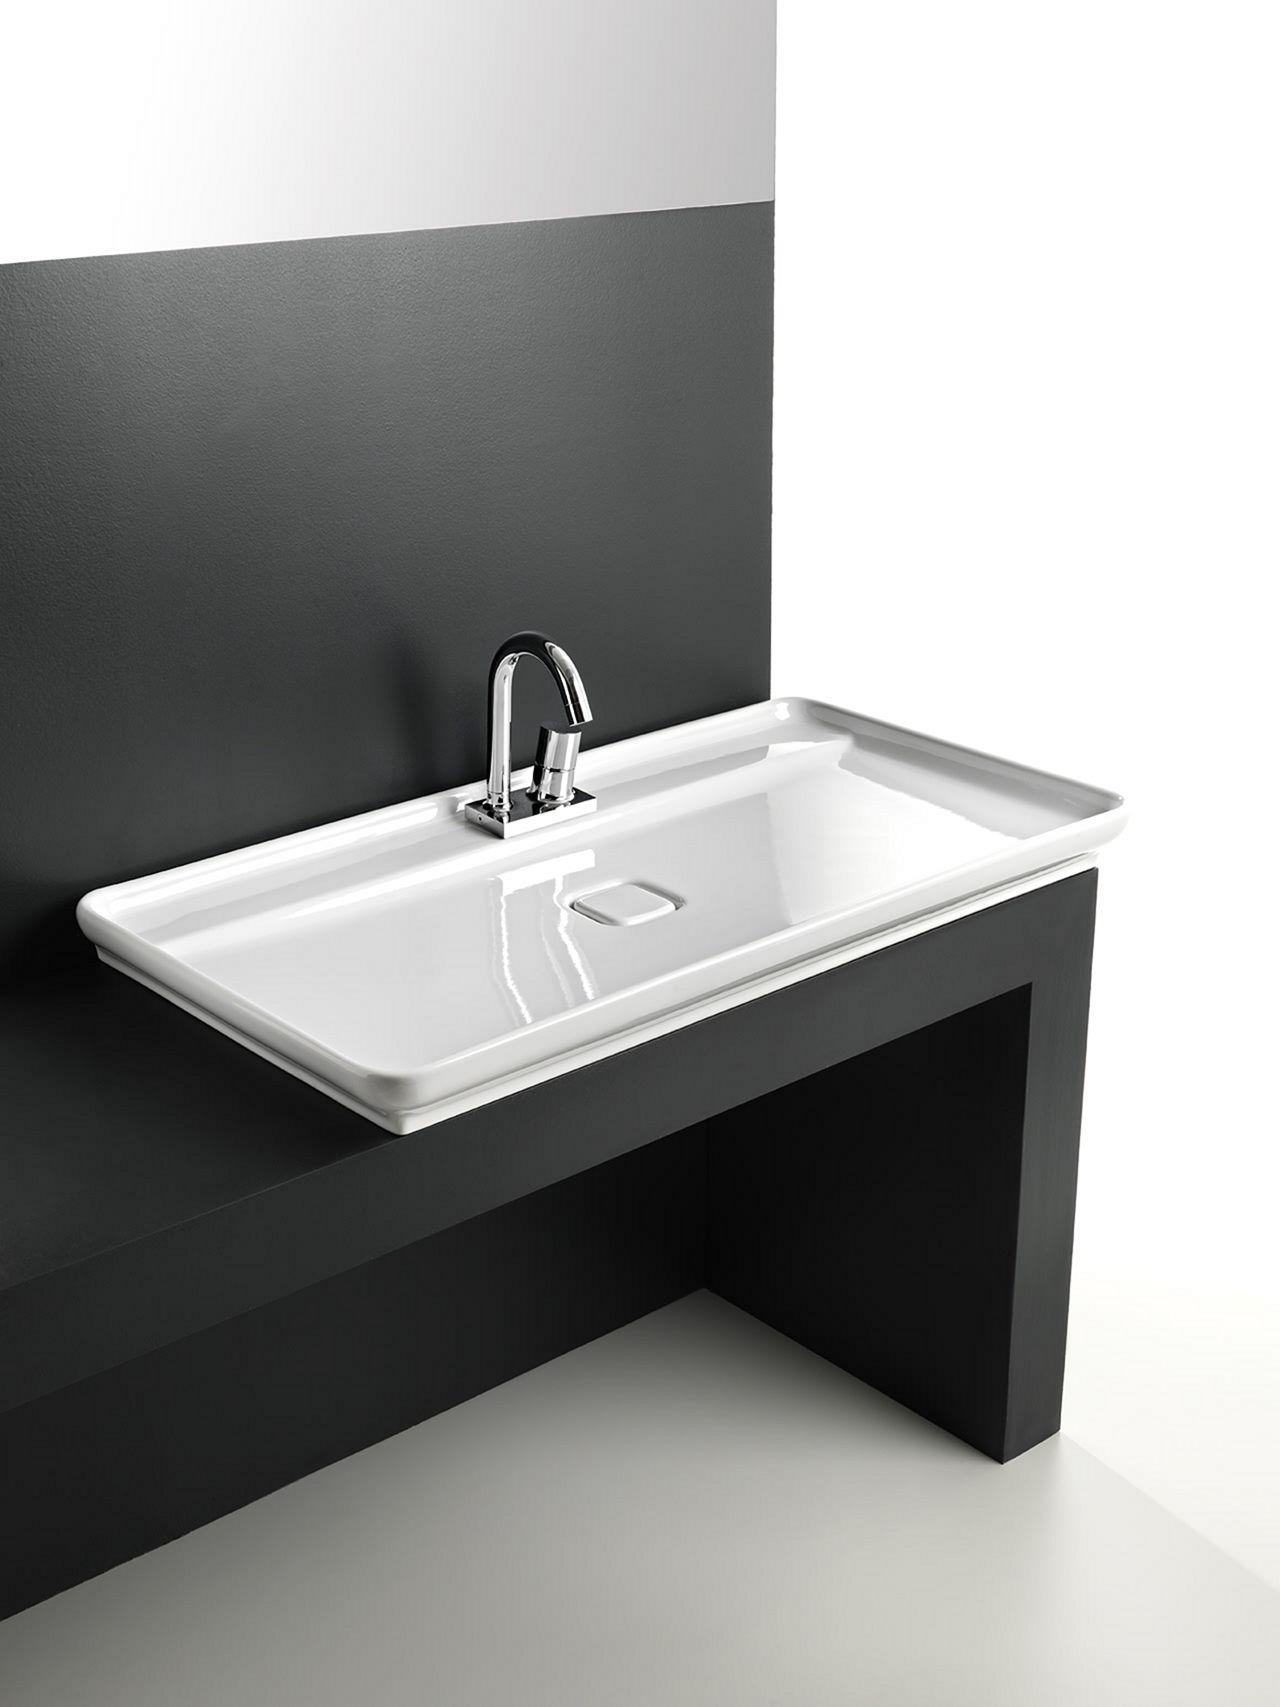 Cool Bathroom Sink Ideas